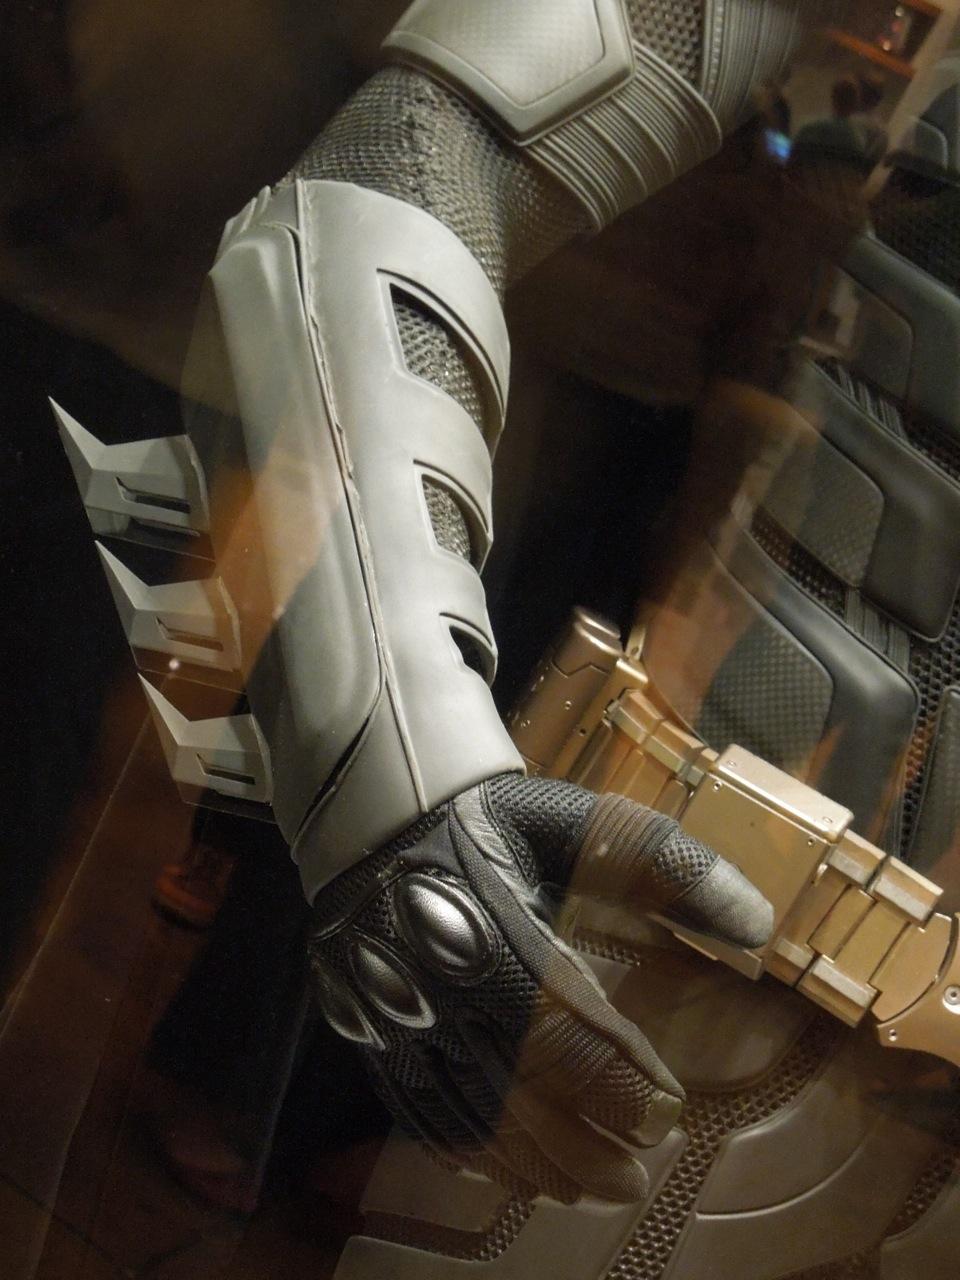 Batman costume glove & Christian Baleu0027s Batman suit from The Dark Knight Rises ...